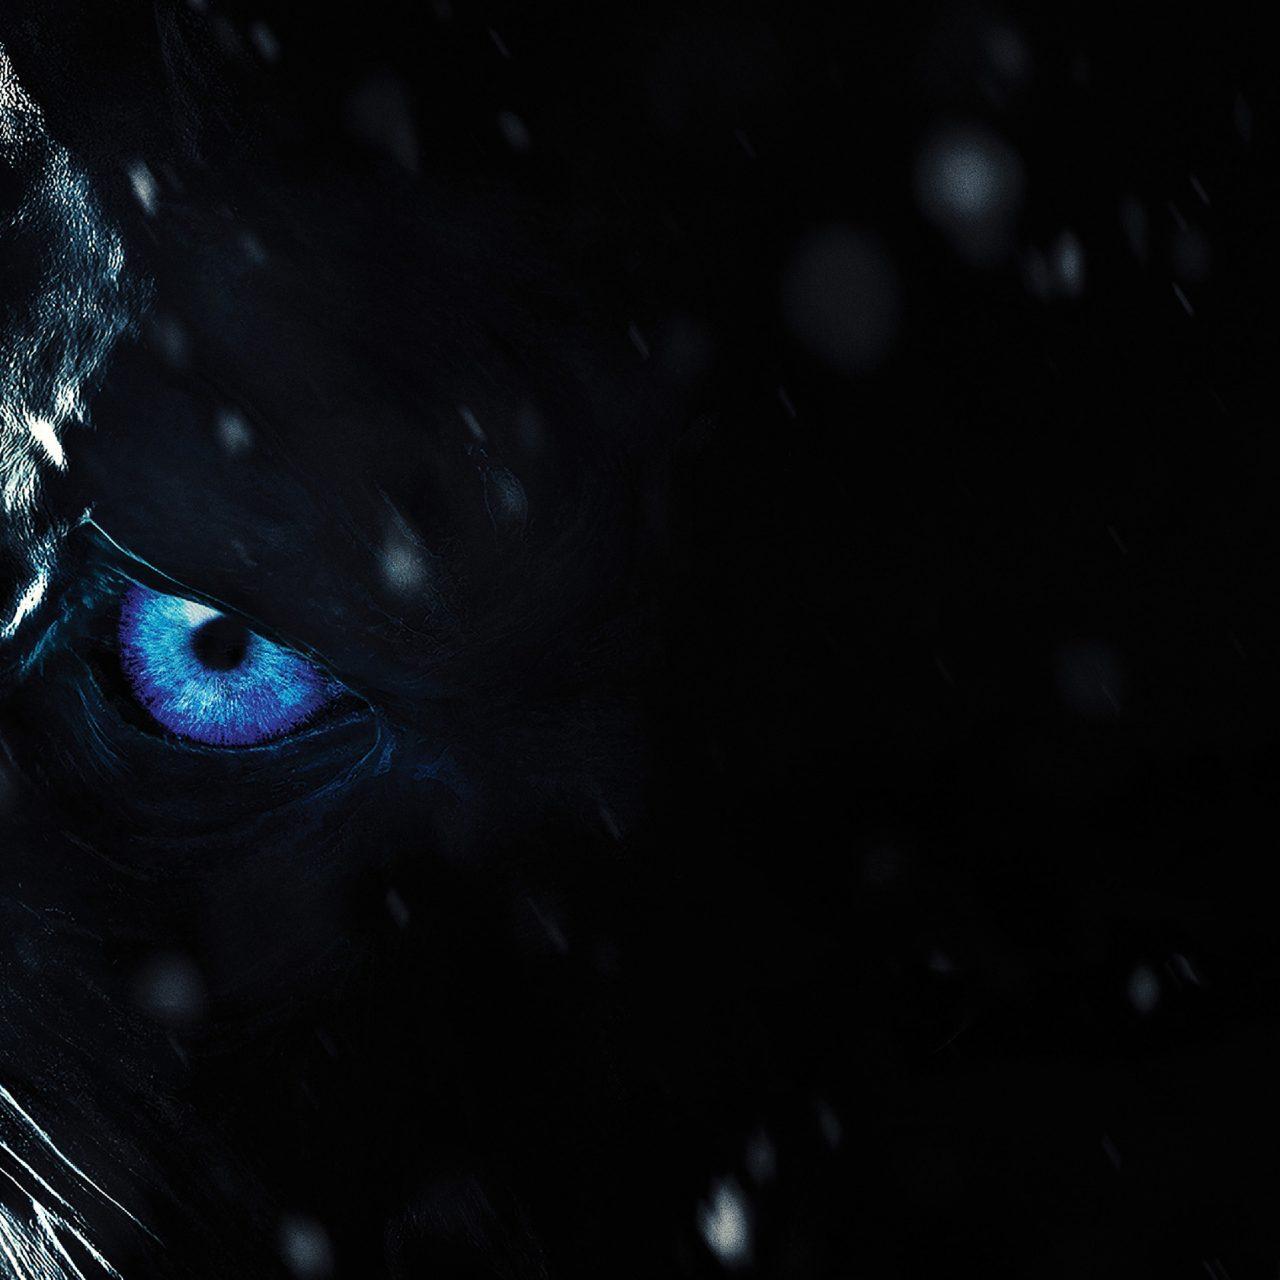 Lucifer Season 3 Hd 4k Wallpaper: Game Of Thrones Season 7 White Walkers TV Show 4K